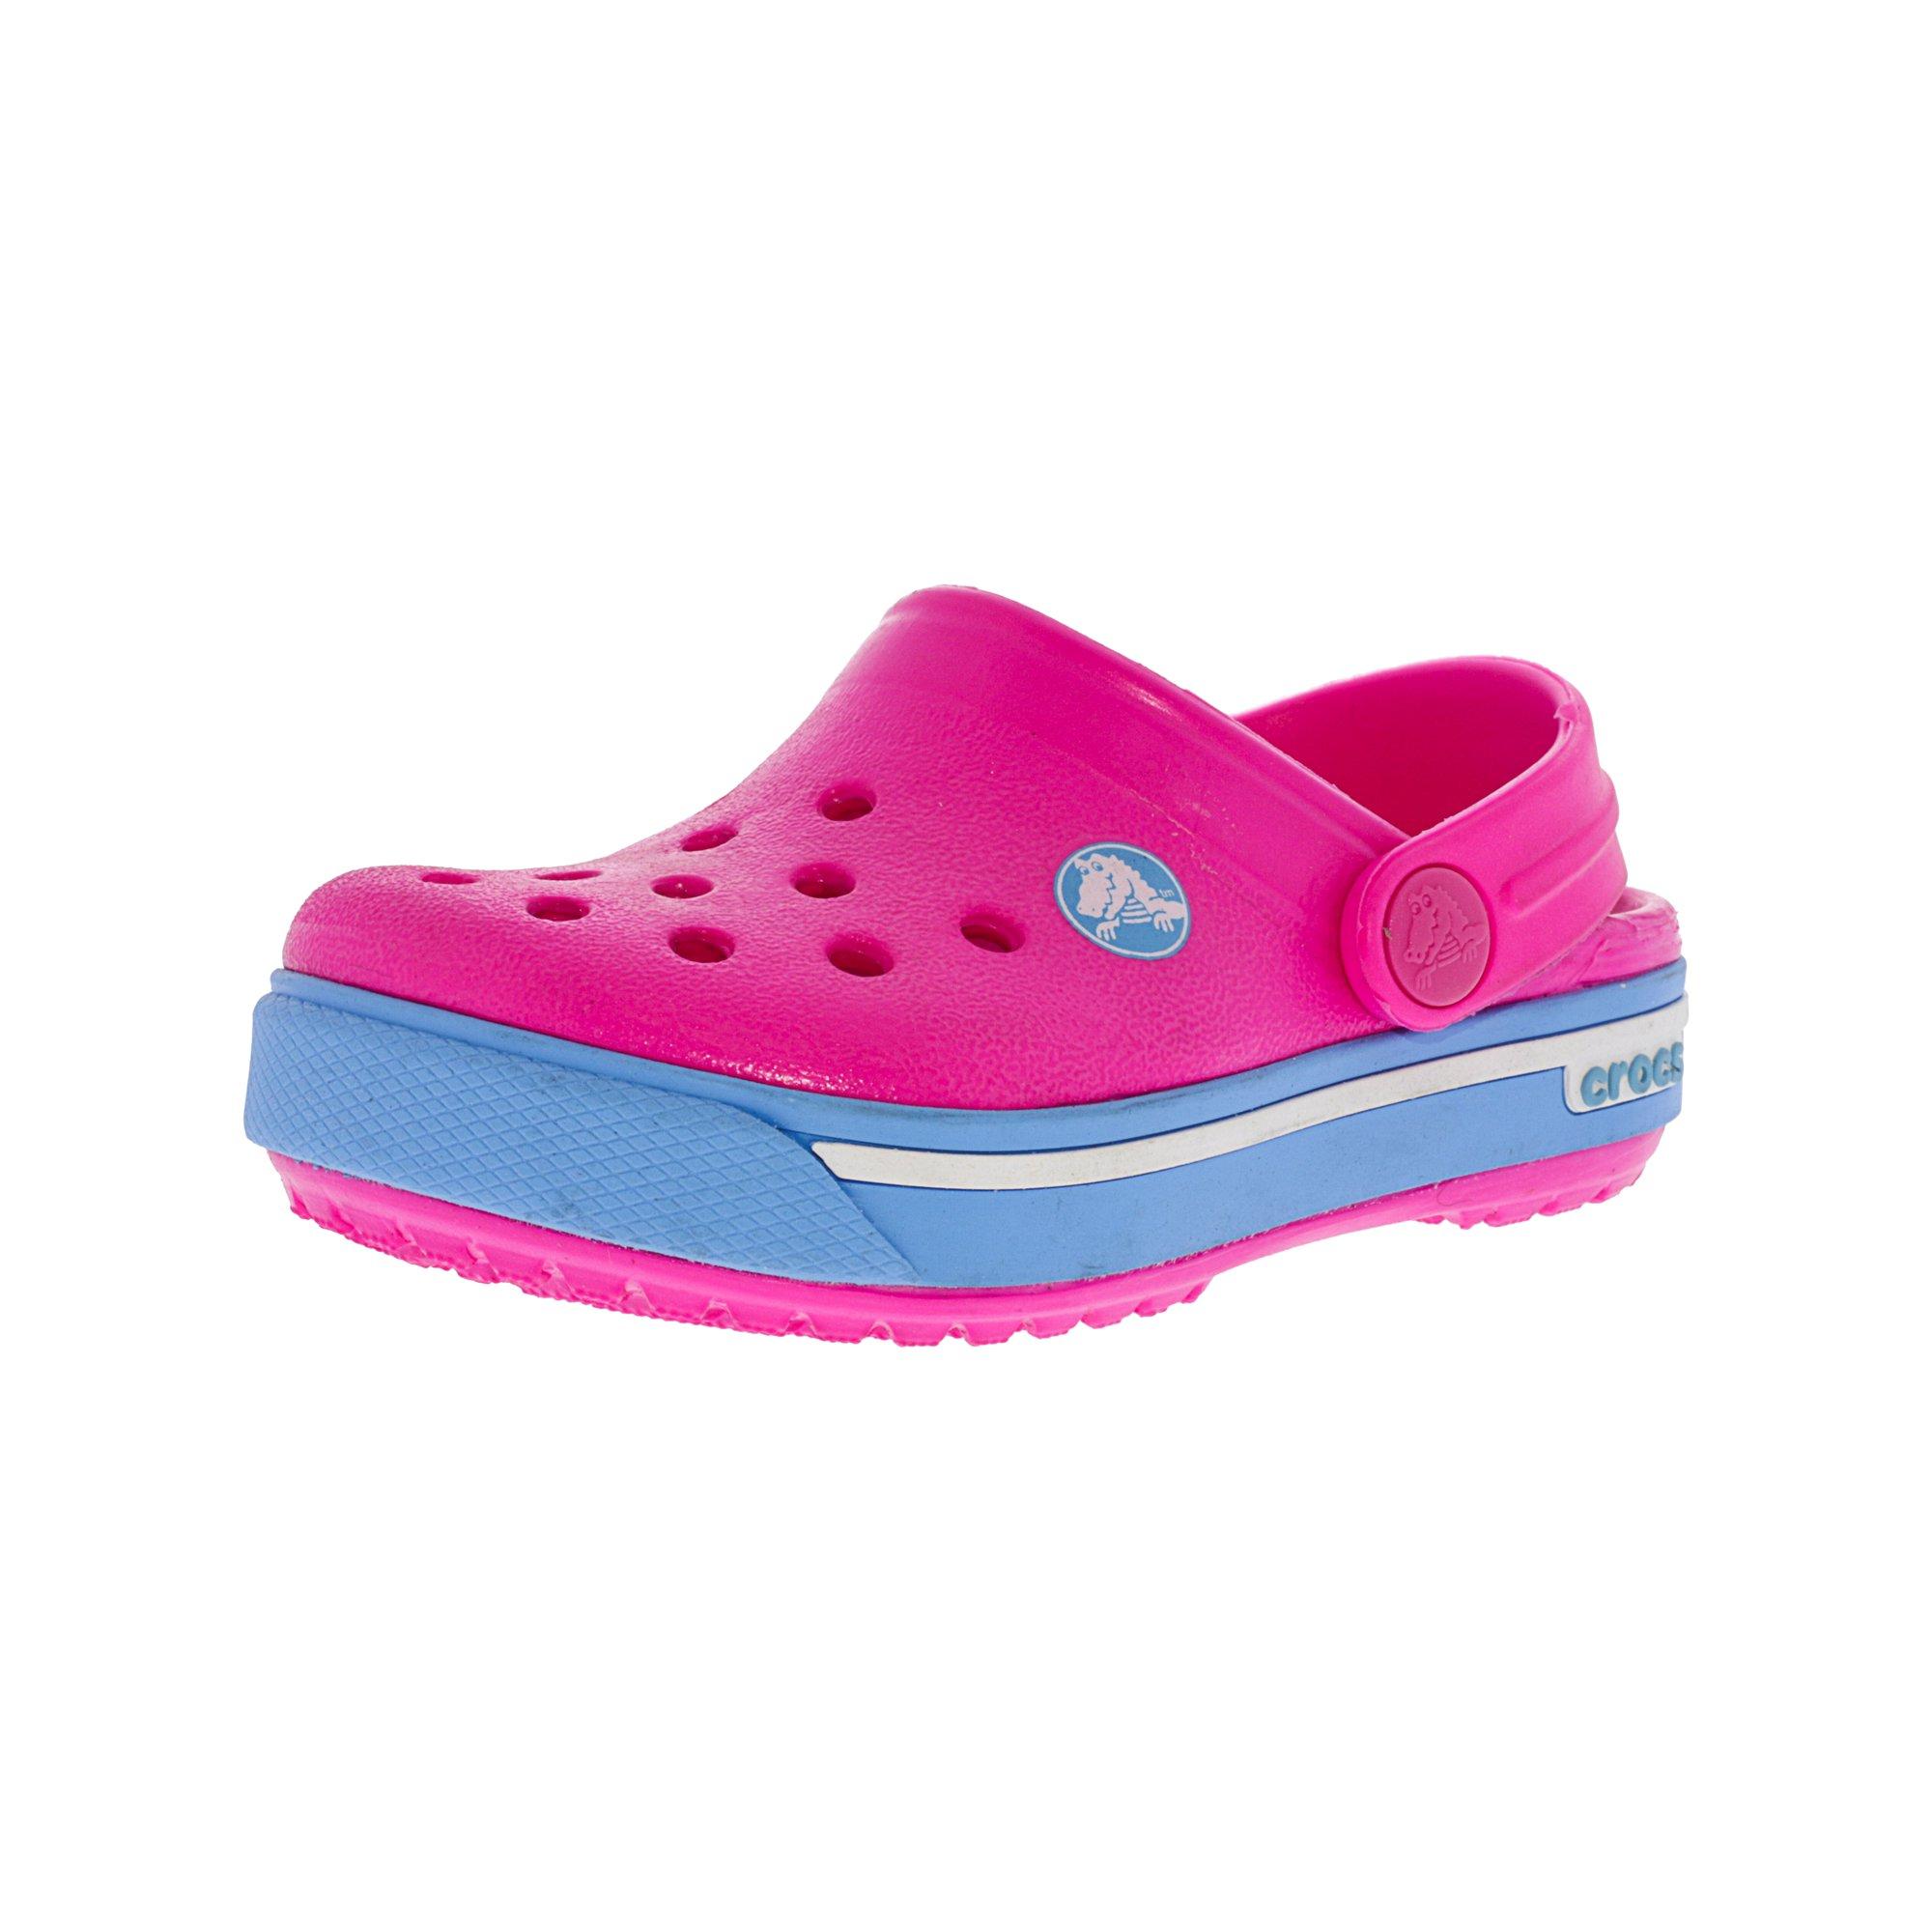 16596b67a Crocs Crocband Ii.5 Clog Neon Magenta   Bluebell Ankle-High Clogs - 4M